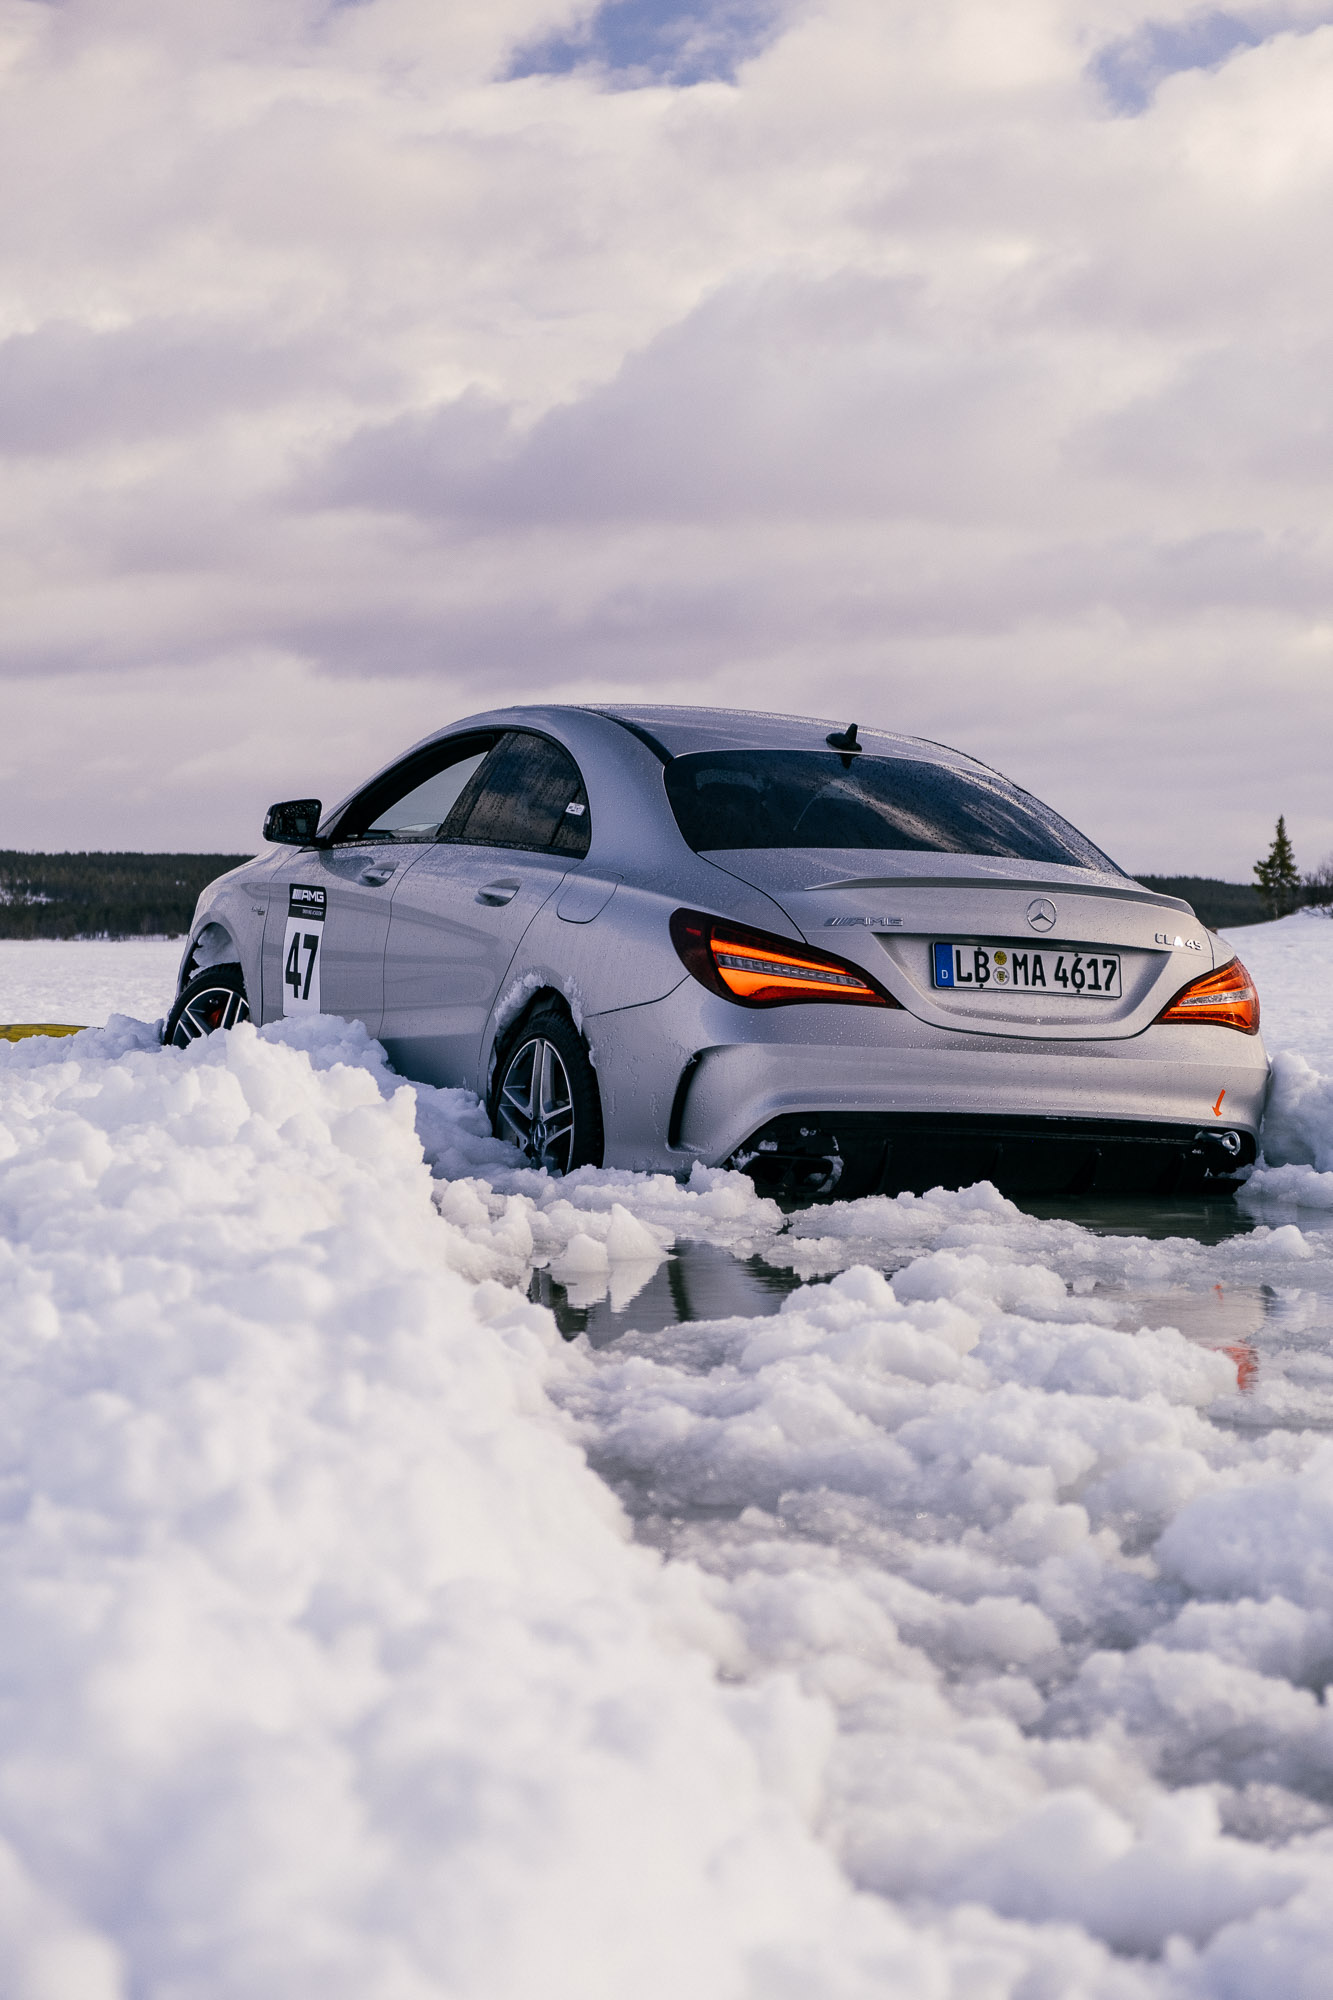 Drive_for_Good_Ice_Drive_by_Maxim_Kuijper-0488.jpg